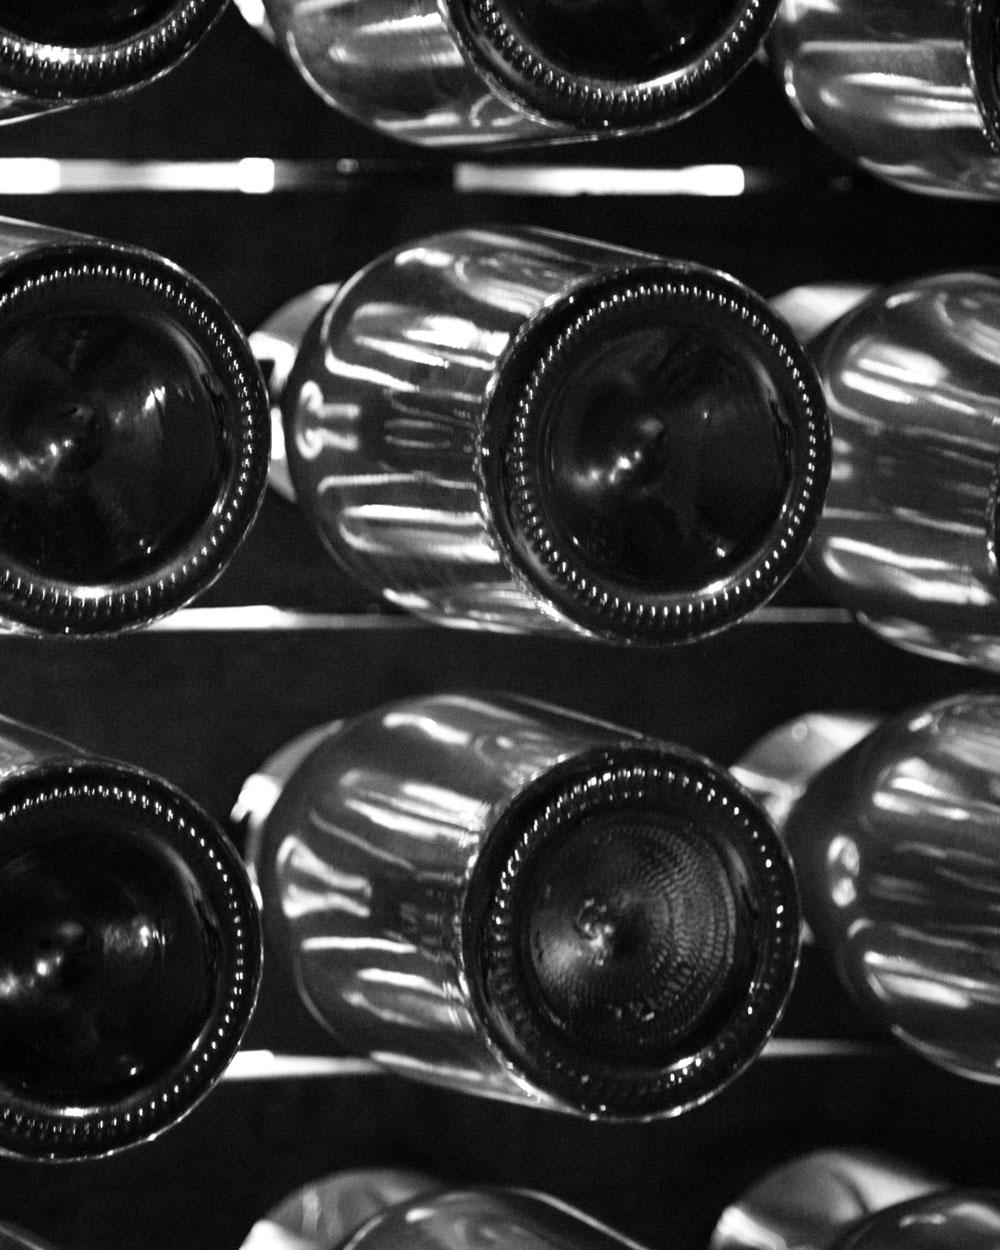 Inside Armand de Brignac - Armand de Brignac Champagne